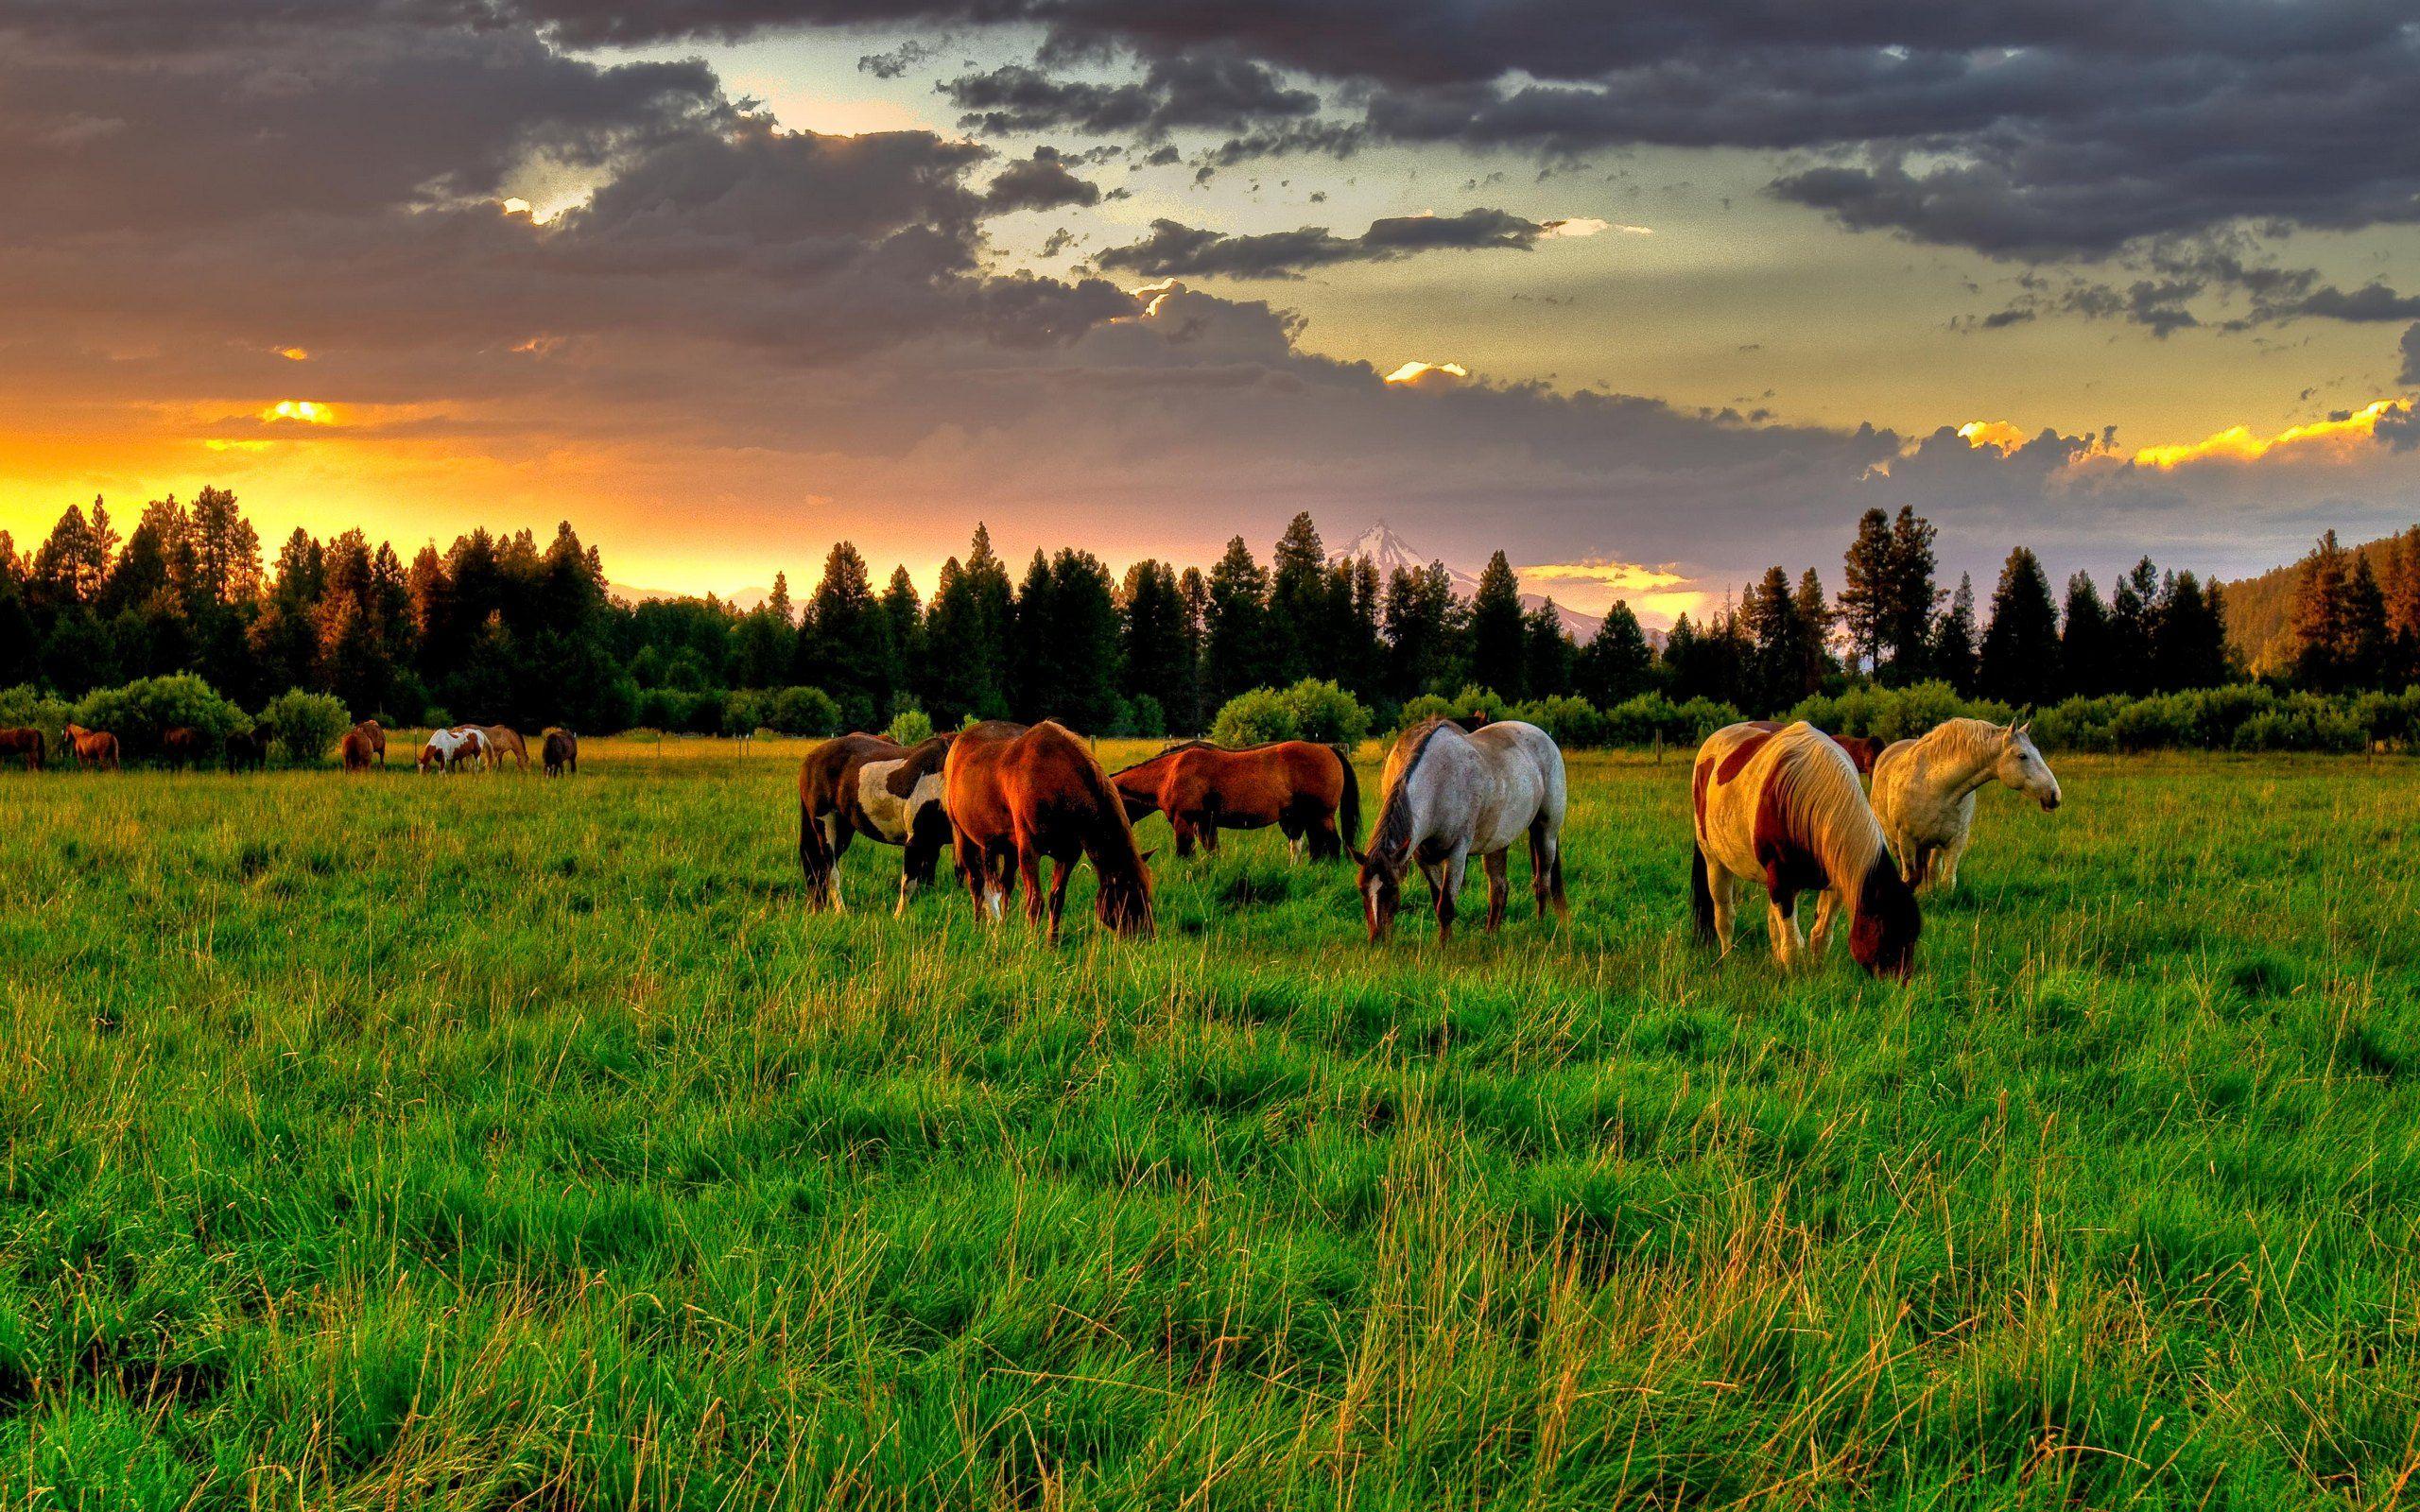 Horse Hd Wallpapers Free Wallpaper Downloads Horse Hd Desktop Horse Wallpaper Beautiful Horses Horses